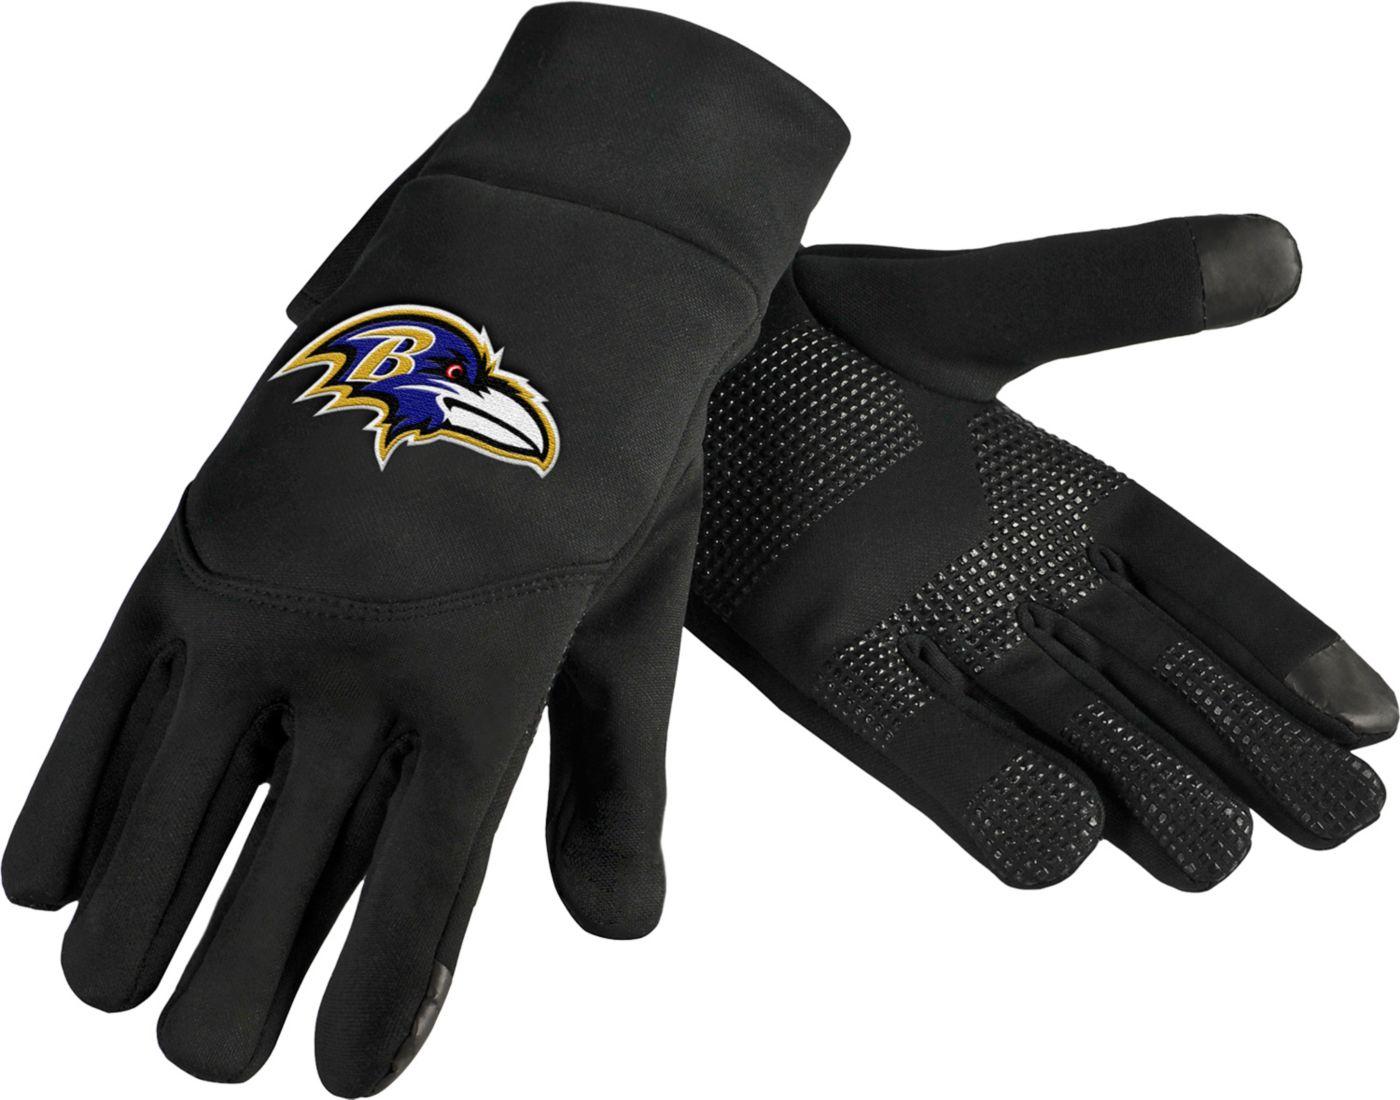 FOCO Baltimore Ravens Texting Gloves